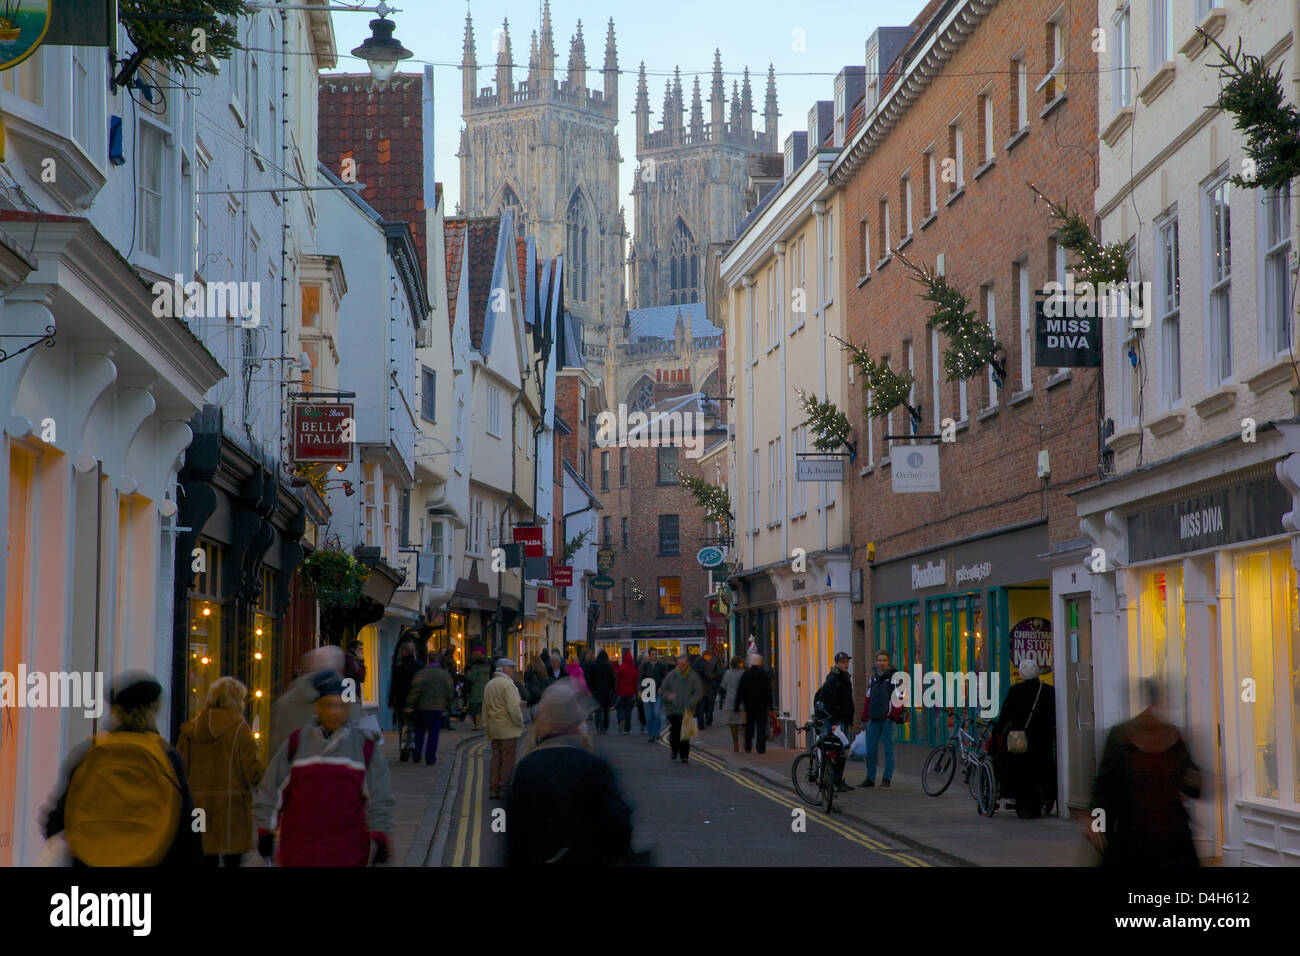 Y Colliergate Minster en Navidad, York, Yorkshire, Inglaterra, Reino Unido. Imagen De Stock